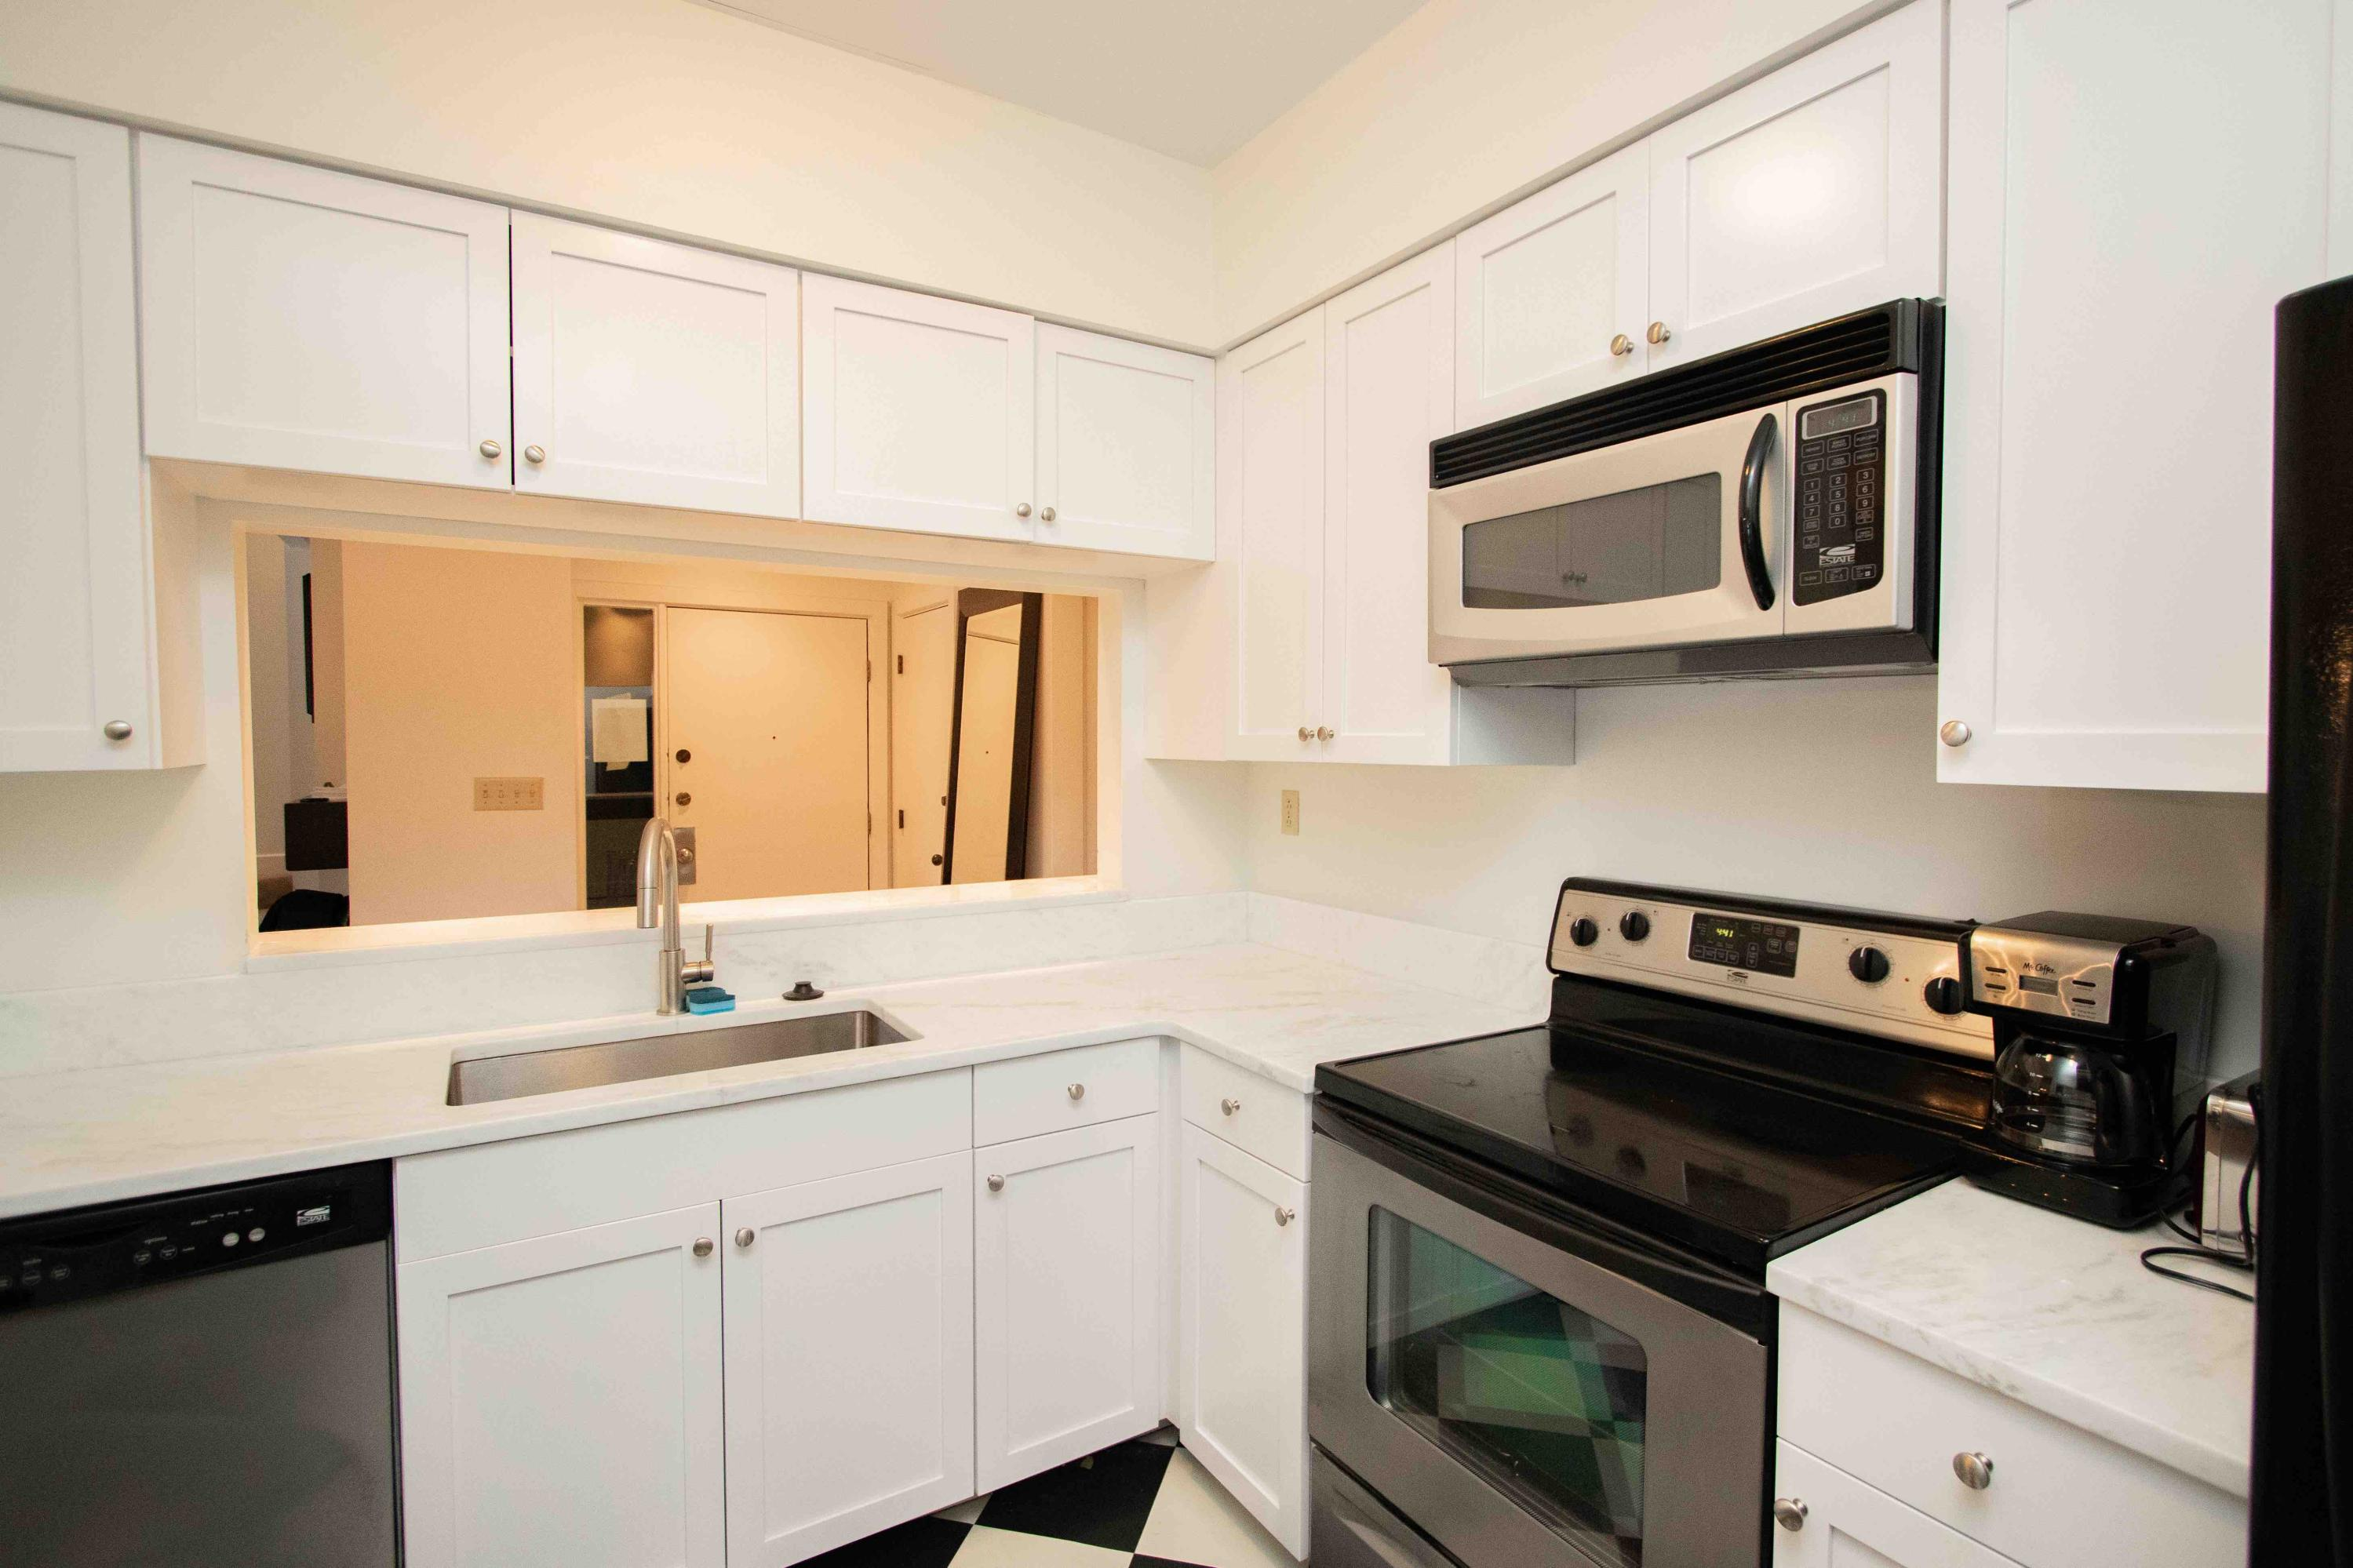 Kiawah Island Homes For Sale - 4916 Green Dolphin, Kiawah Island, SC - 9